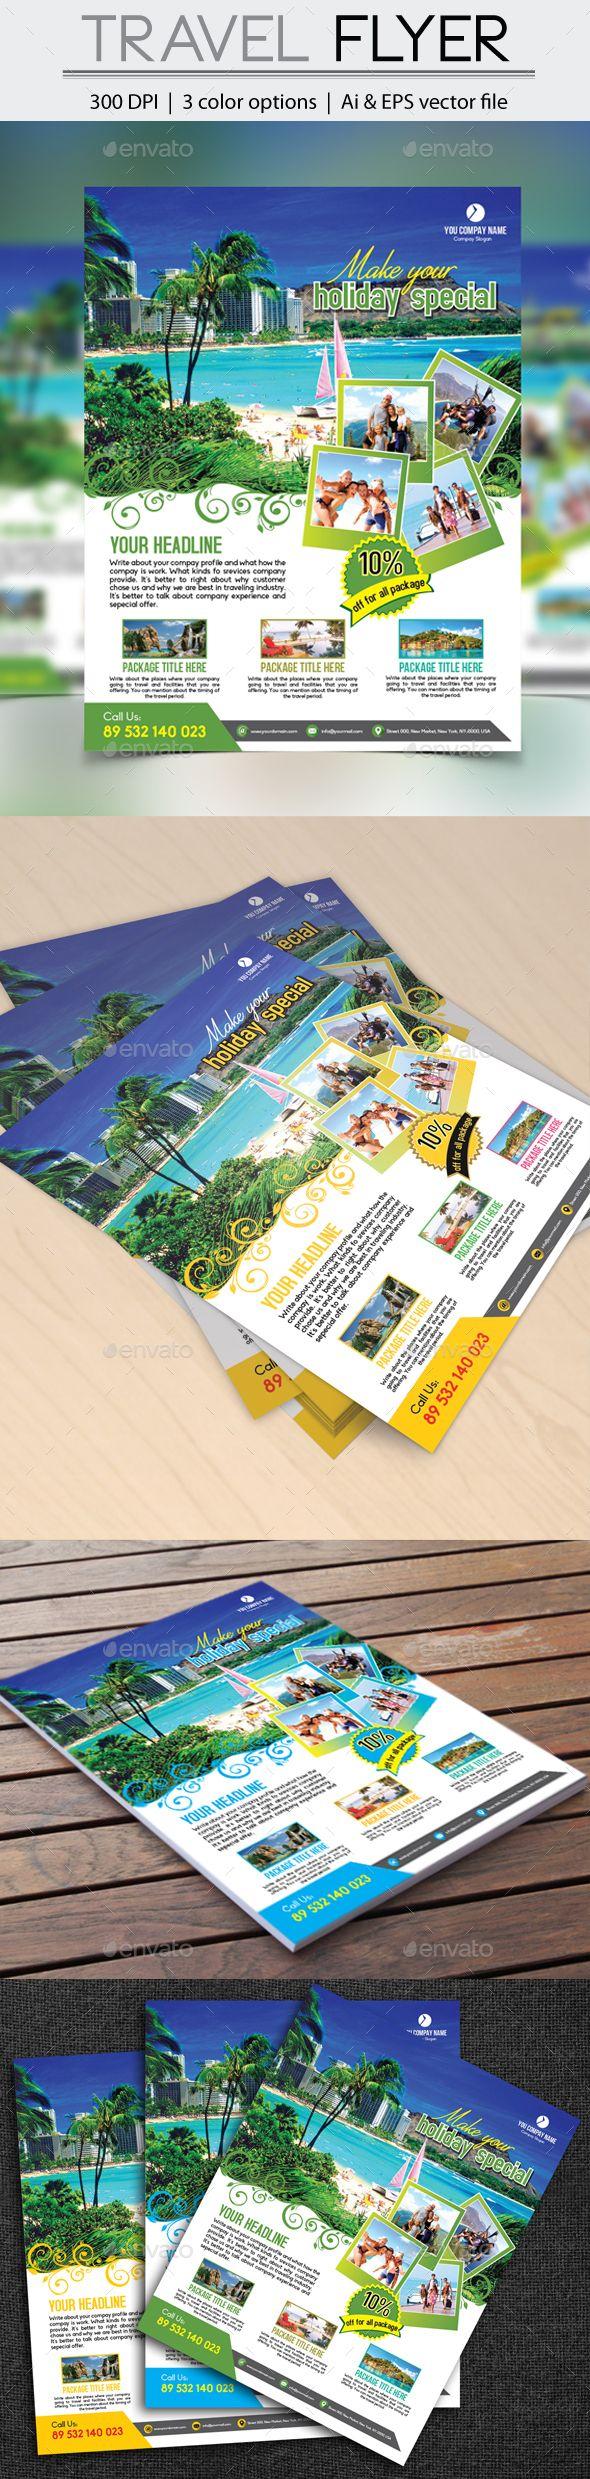 travel flyers